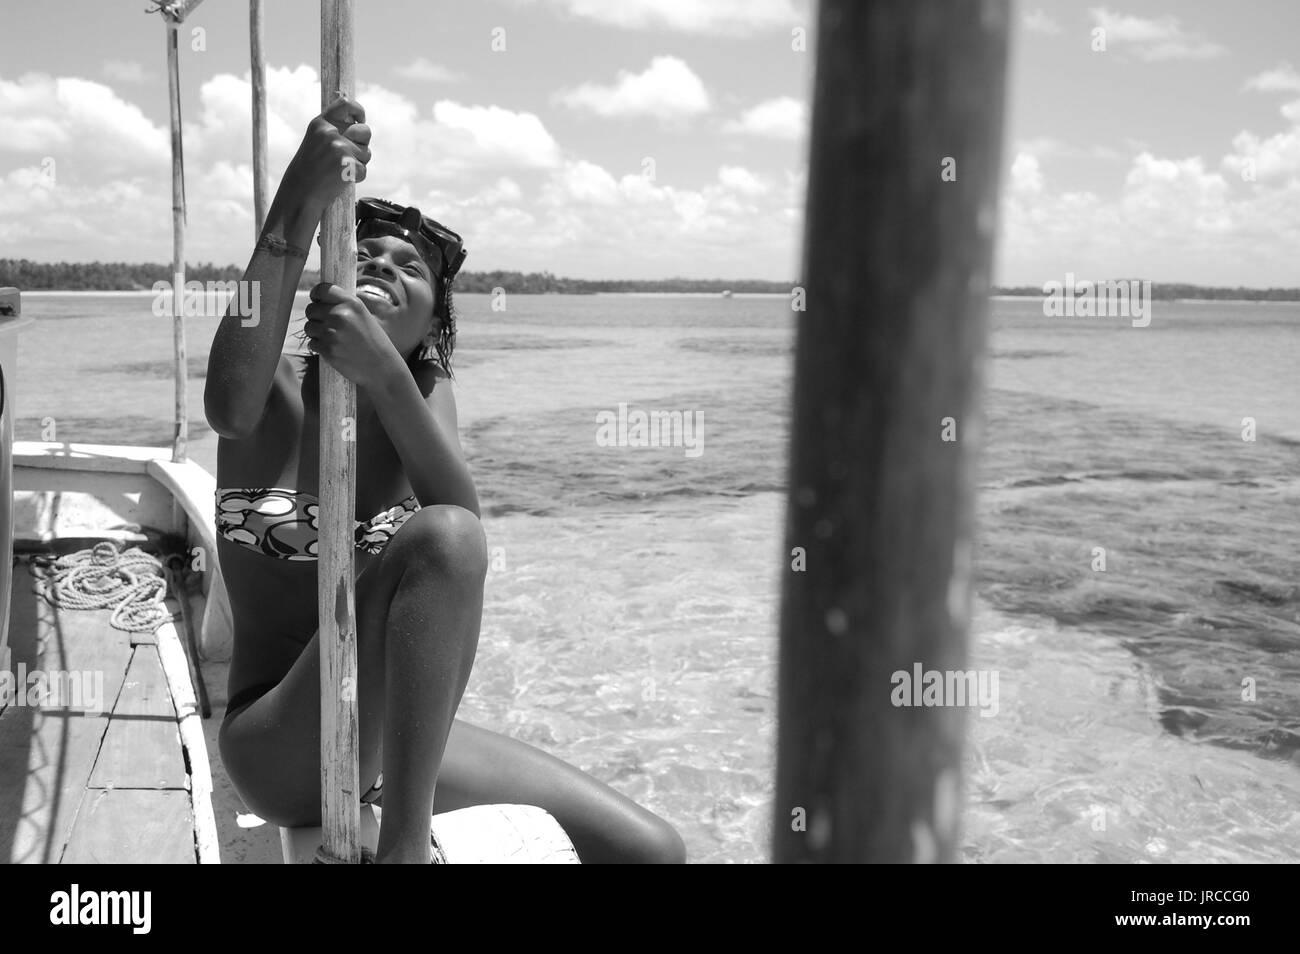 BRA, Brasilien, Bahia, Boipeba, 23.09.2009, Ausflugsboot mit Schnorchlerin in den Piscinas Naturais vor der Insel Boipeba.  [(c) (FREELENS Pool) Ralf  - Stock Image